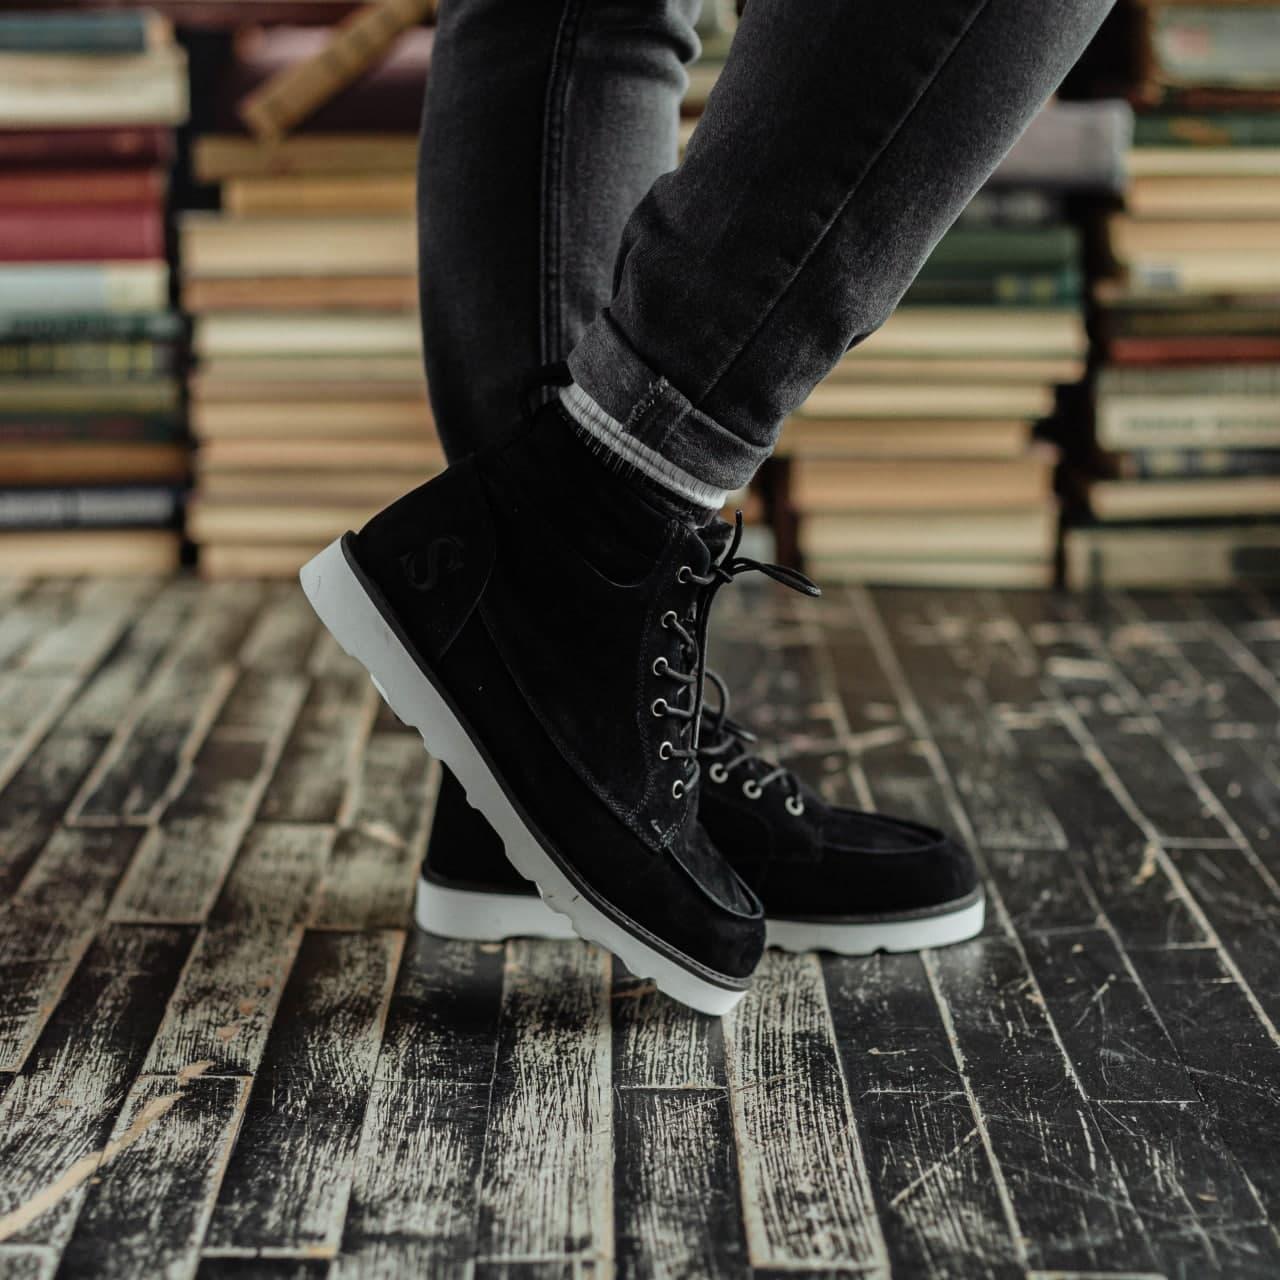 Ботинки South indigo black - фото 2